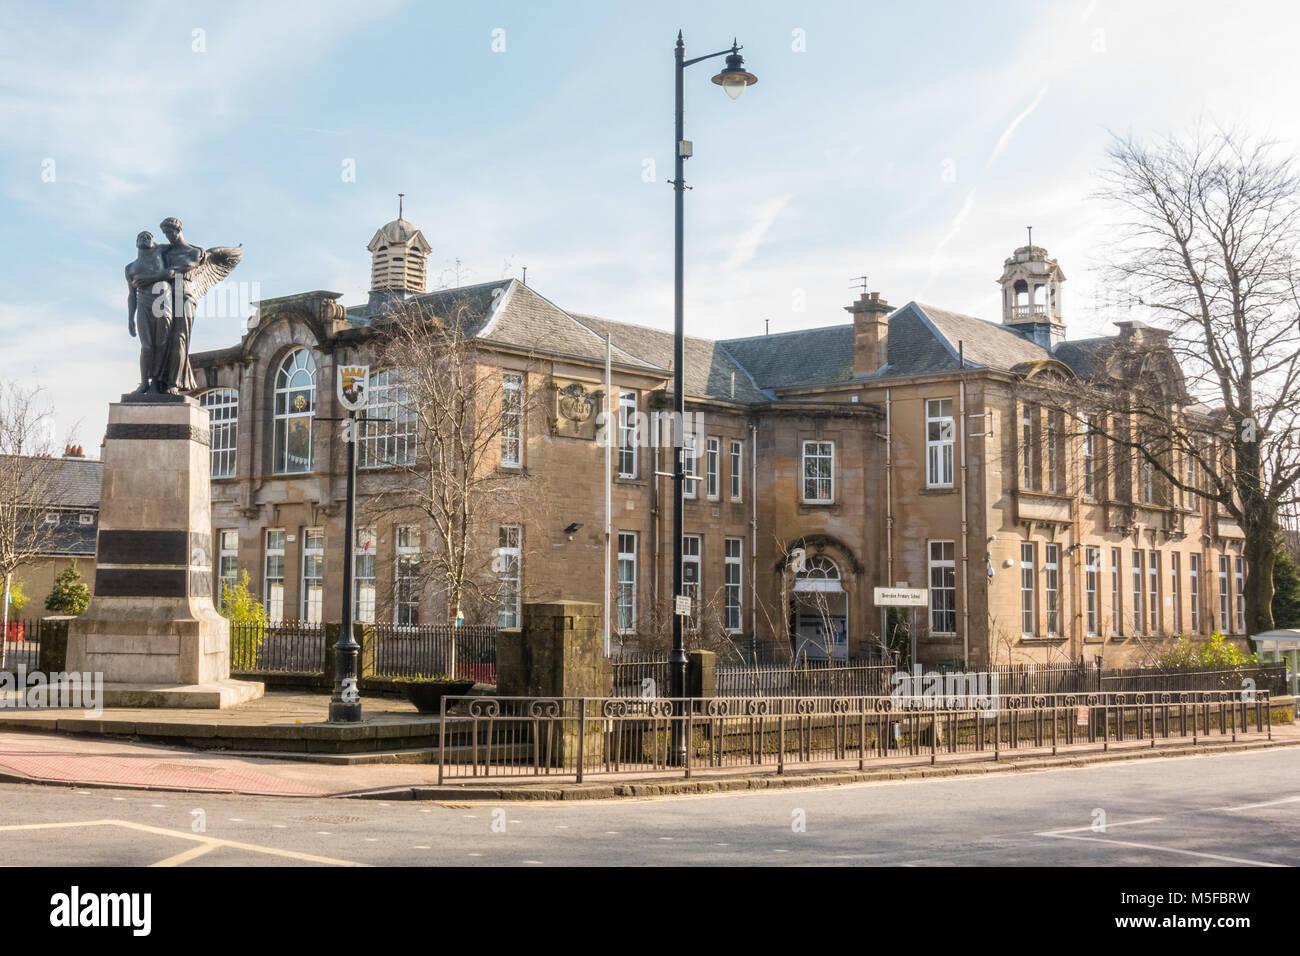 Bearsden école primaire, Bearsden Cross, Ecosse, Royaume-Uni Photo Stock